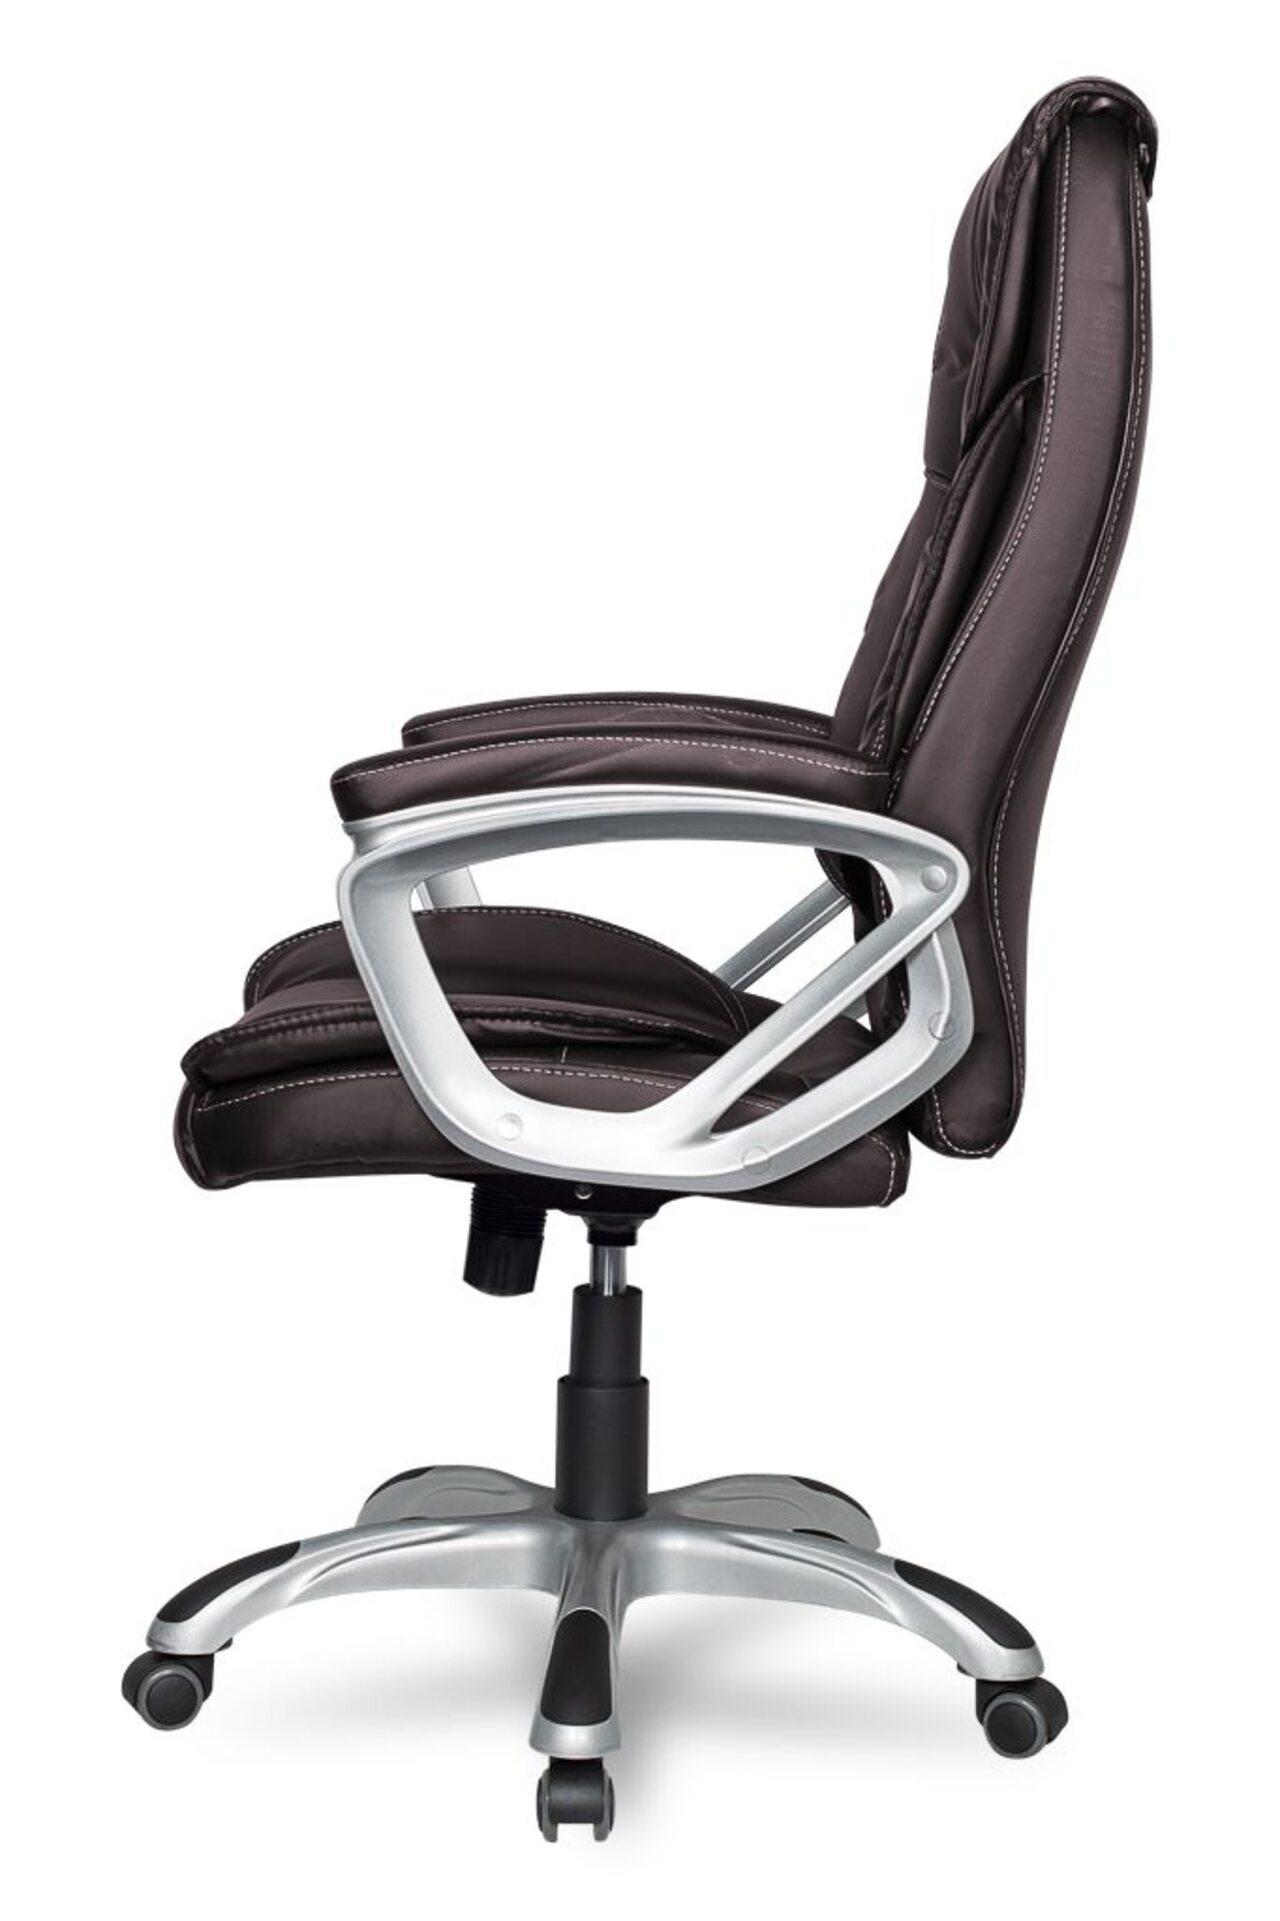 Кресло руководителя College CLG-615 LXH - фото 10